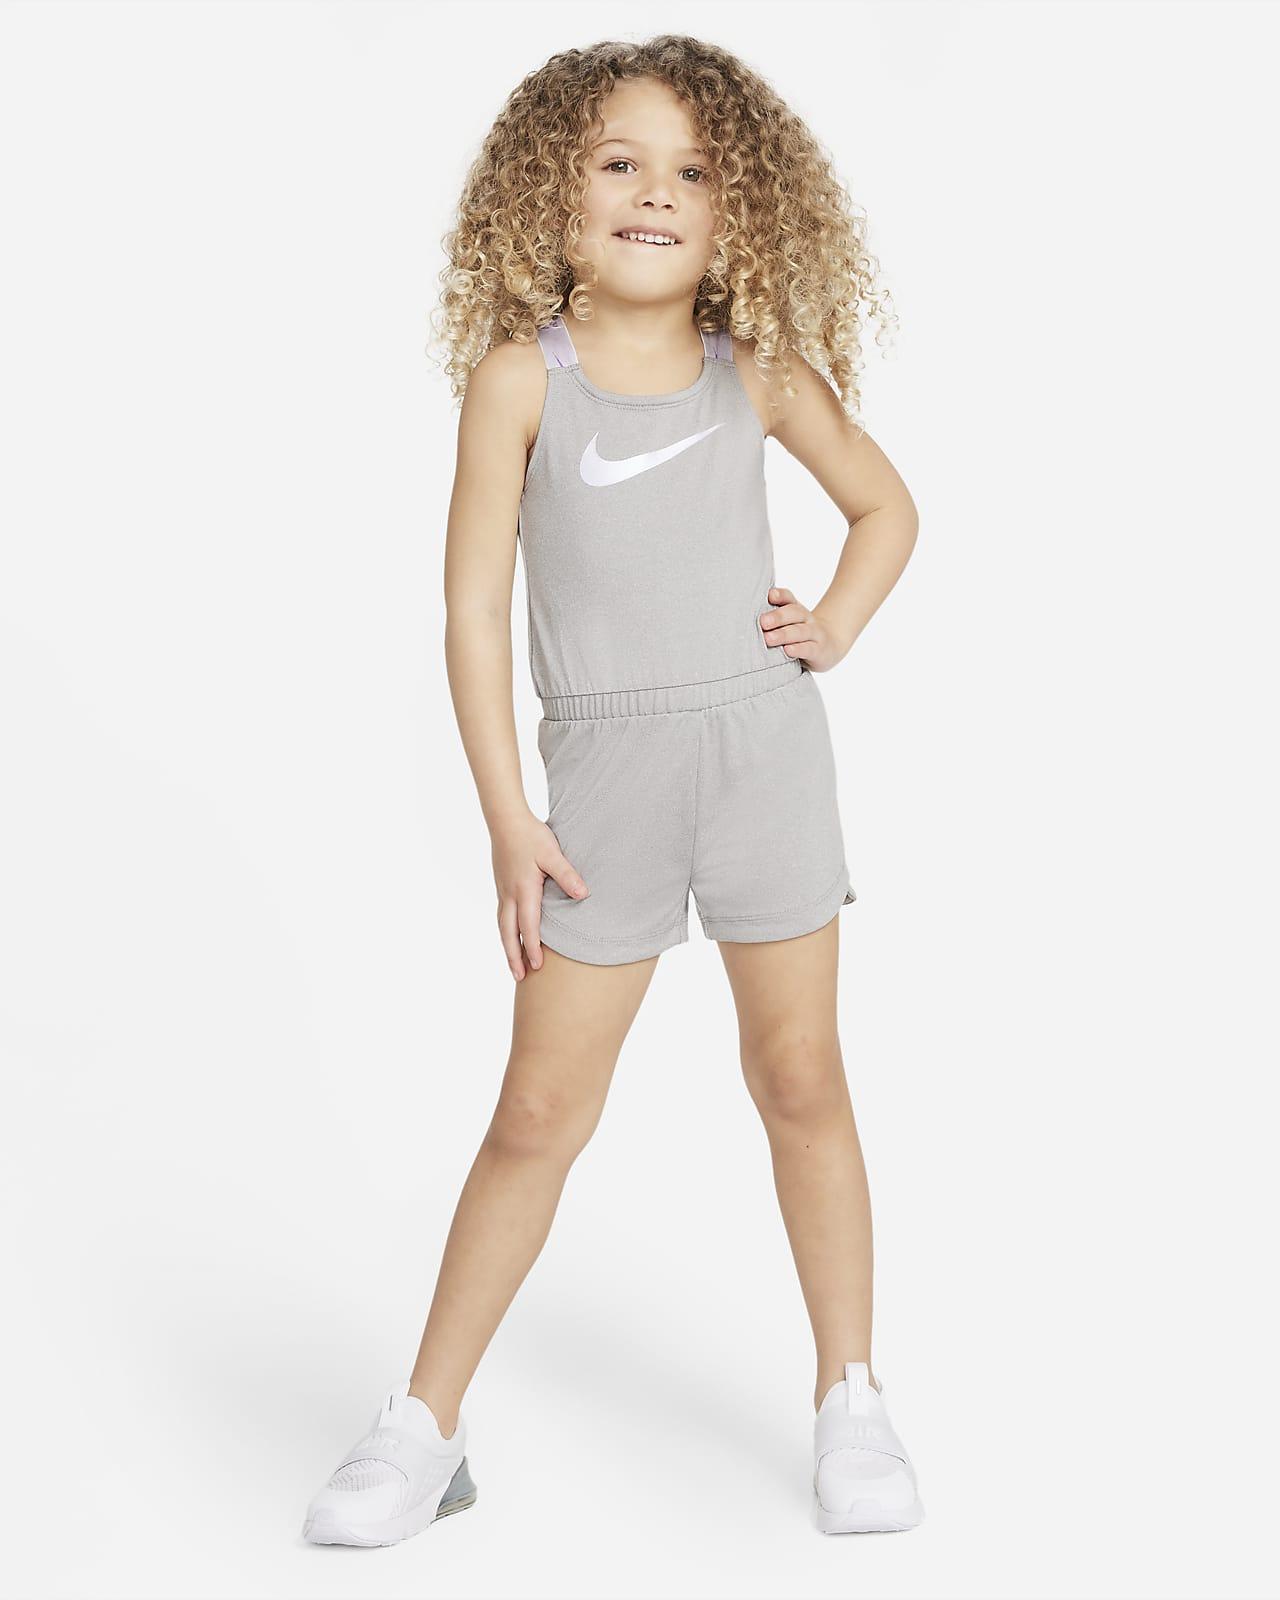 Nike Dri-FIT Toddler Romper